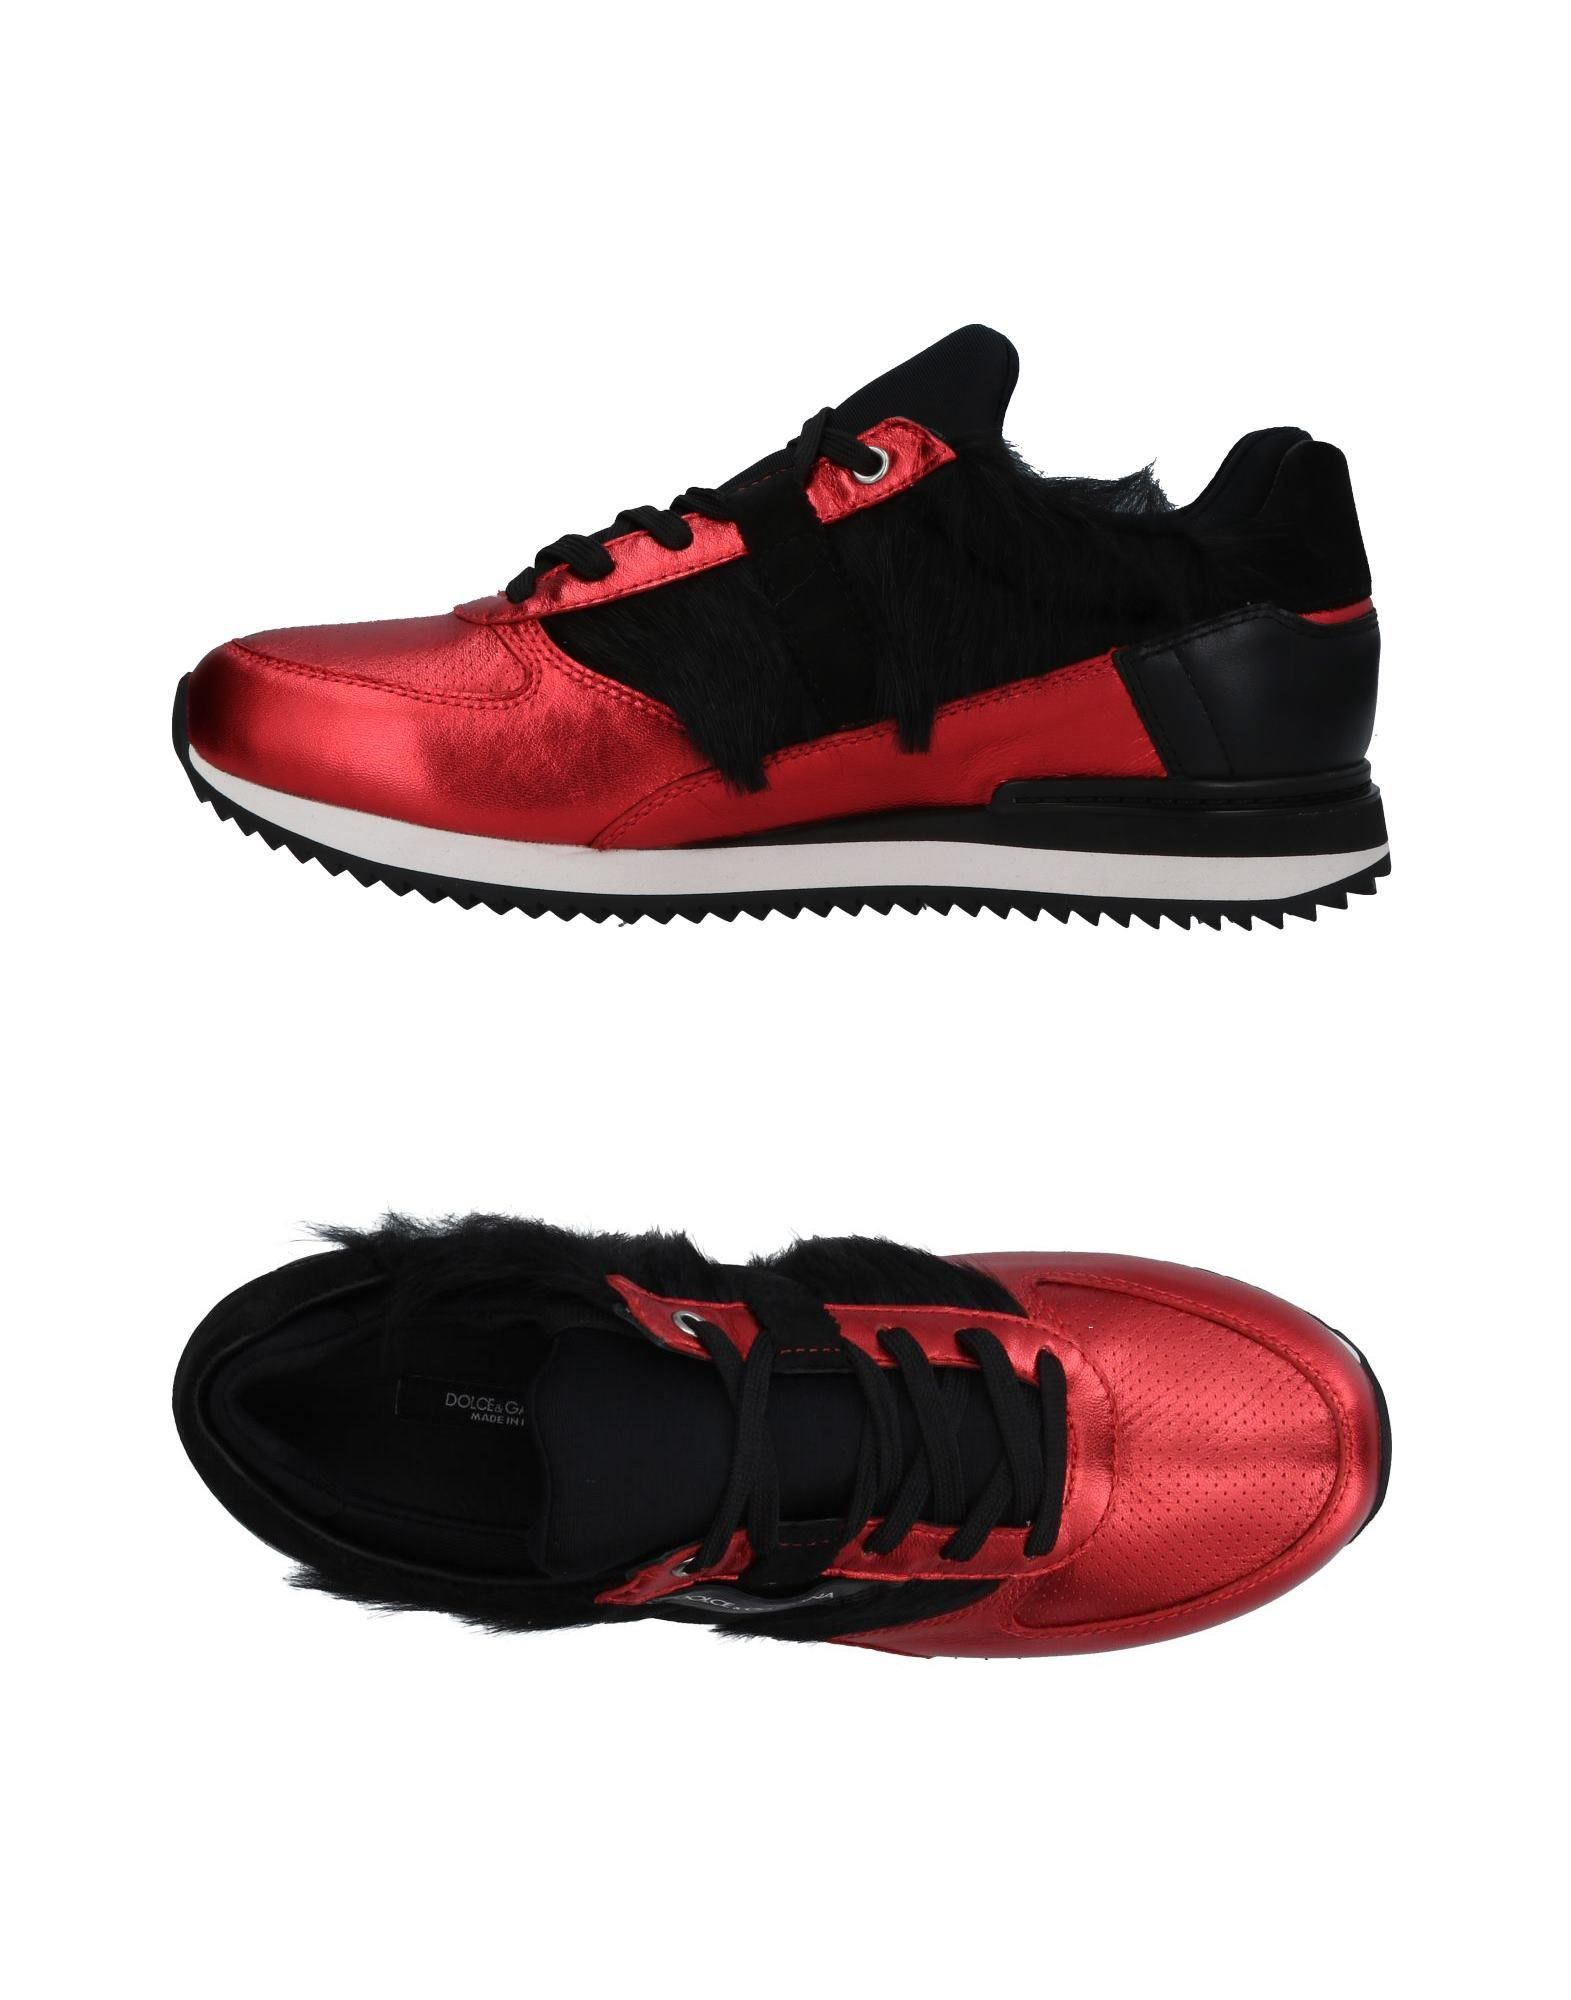 Dolce & Gabbana Sneakers Herren  11406112NJ Gute Qualität beliebte Schuhe